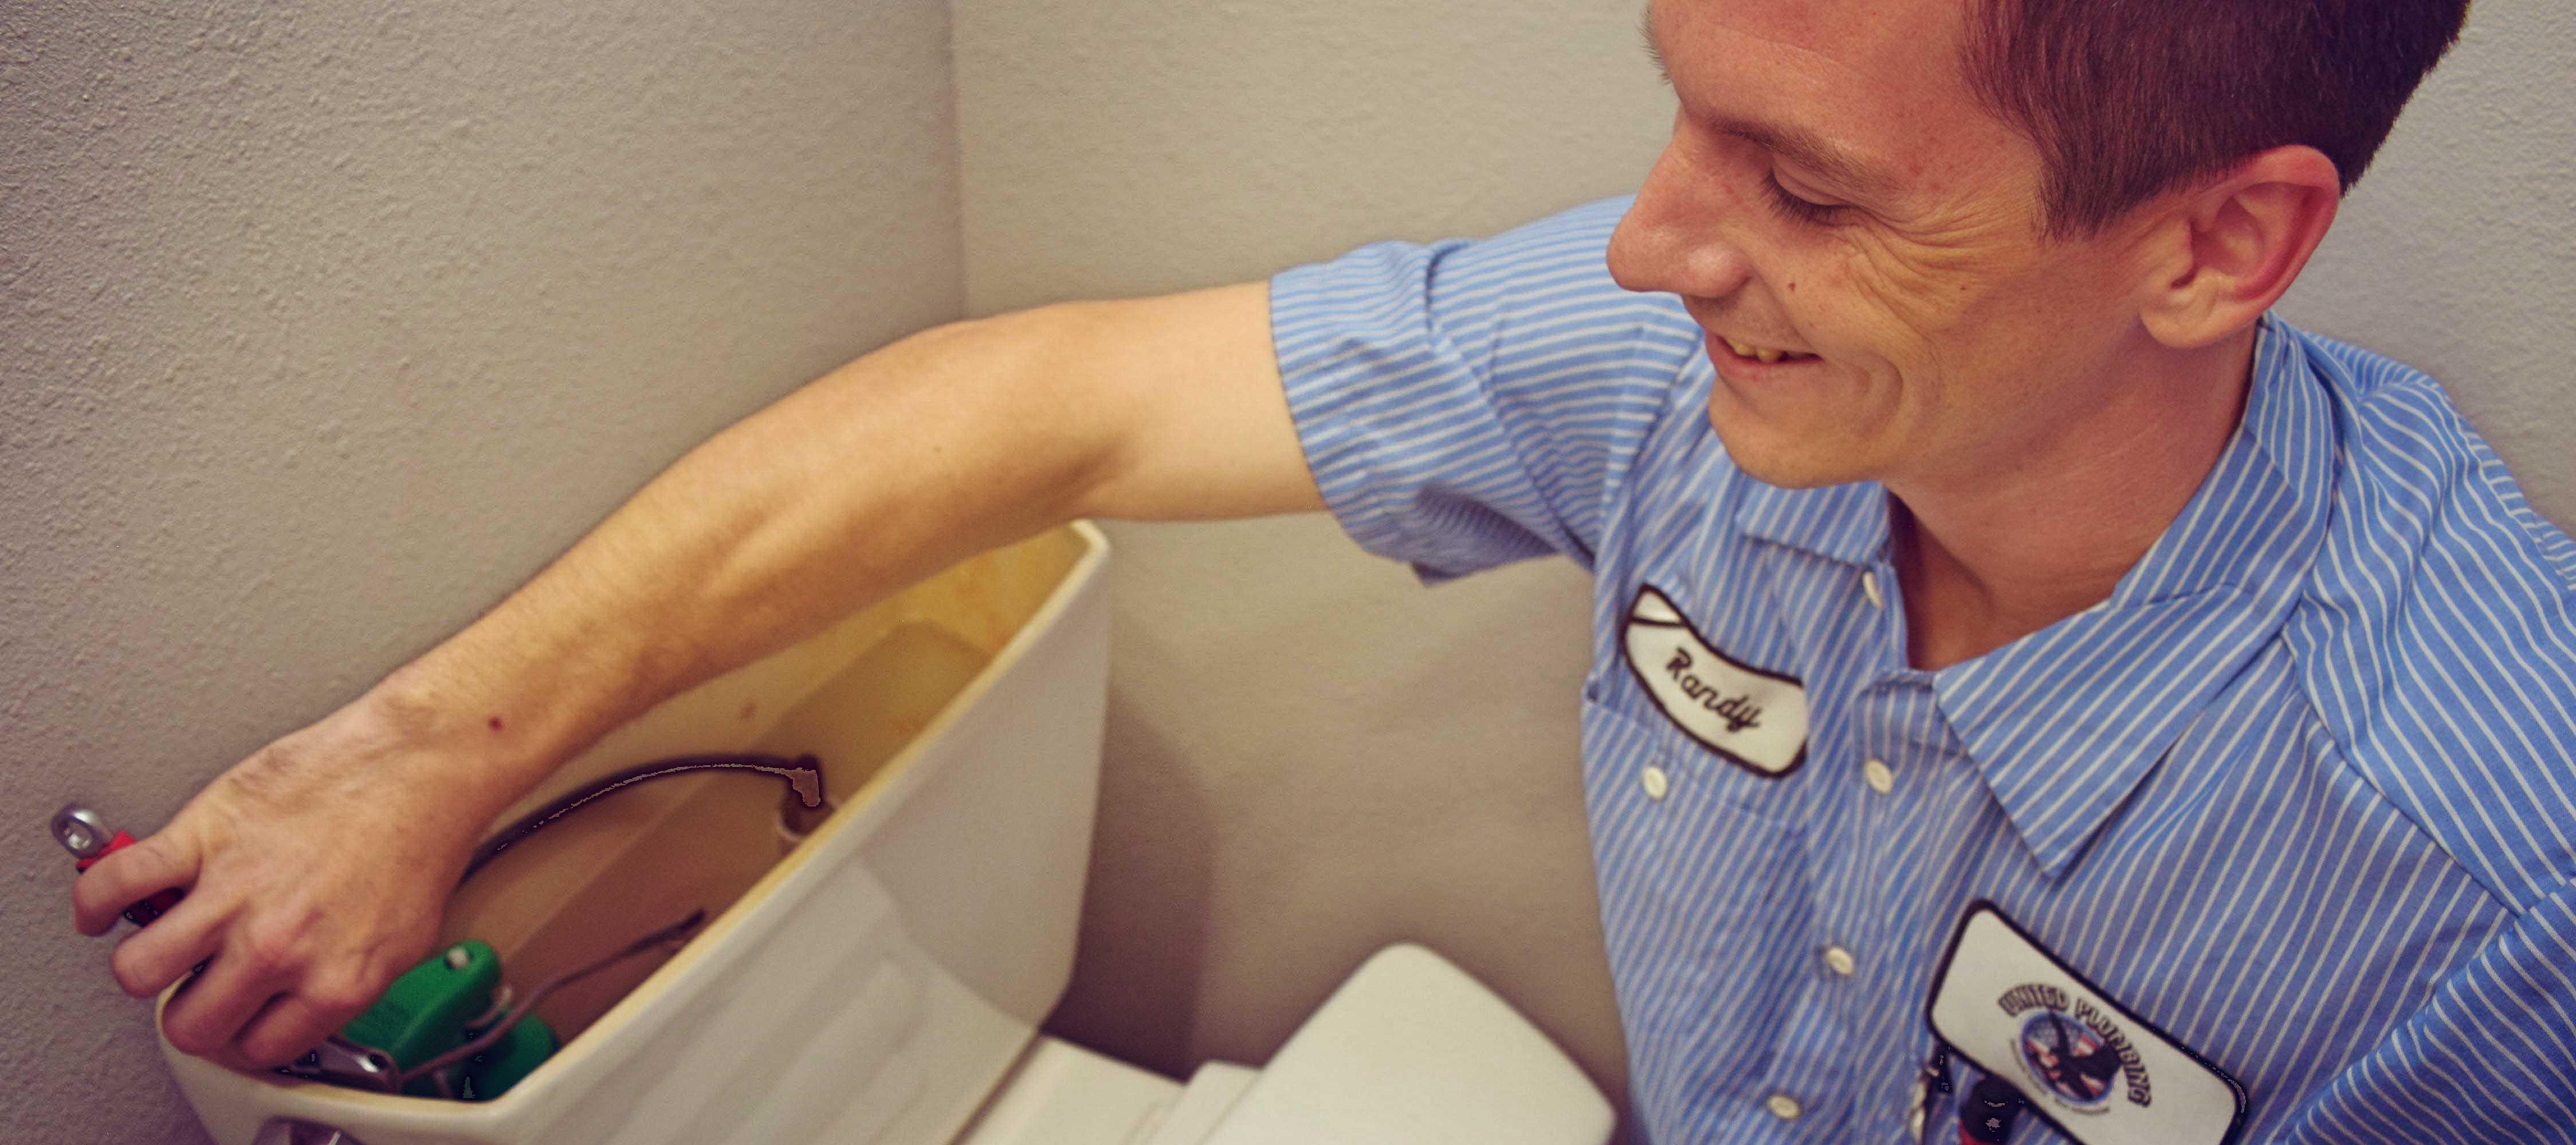 Toilet Repair in Springfield Missouri